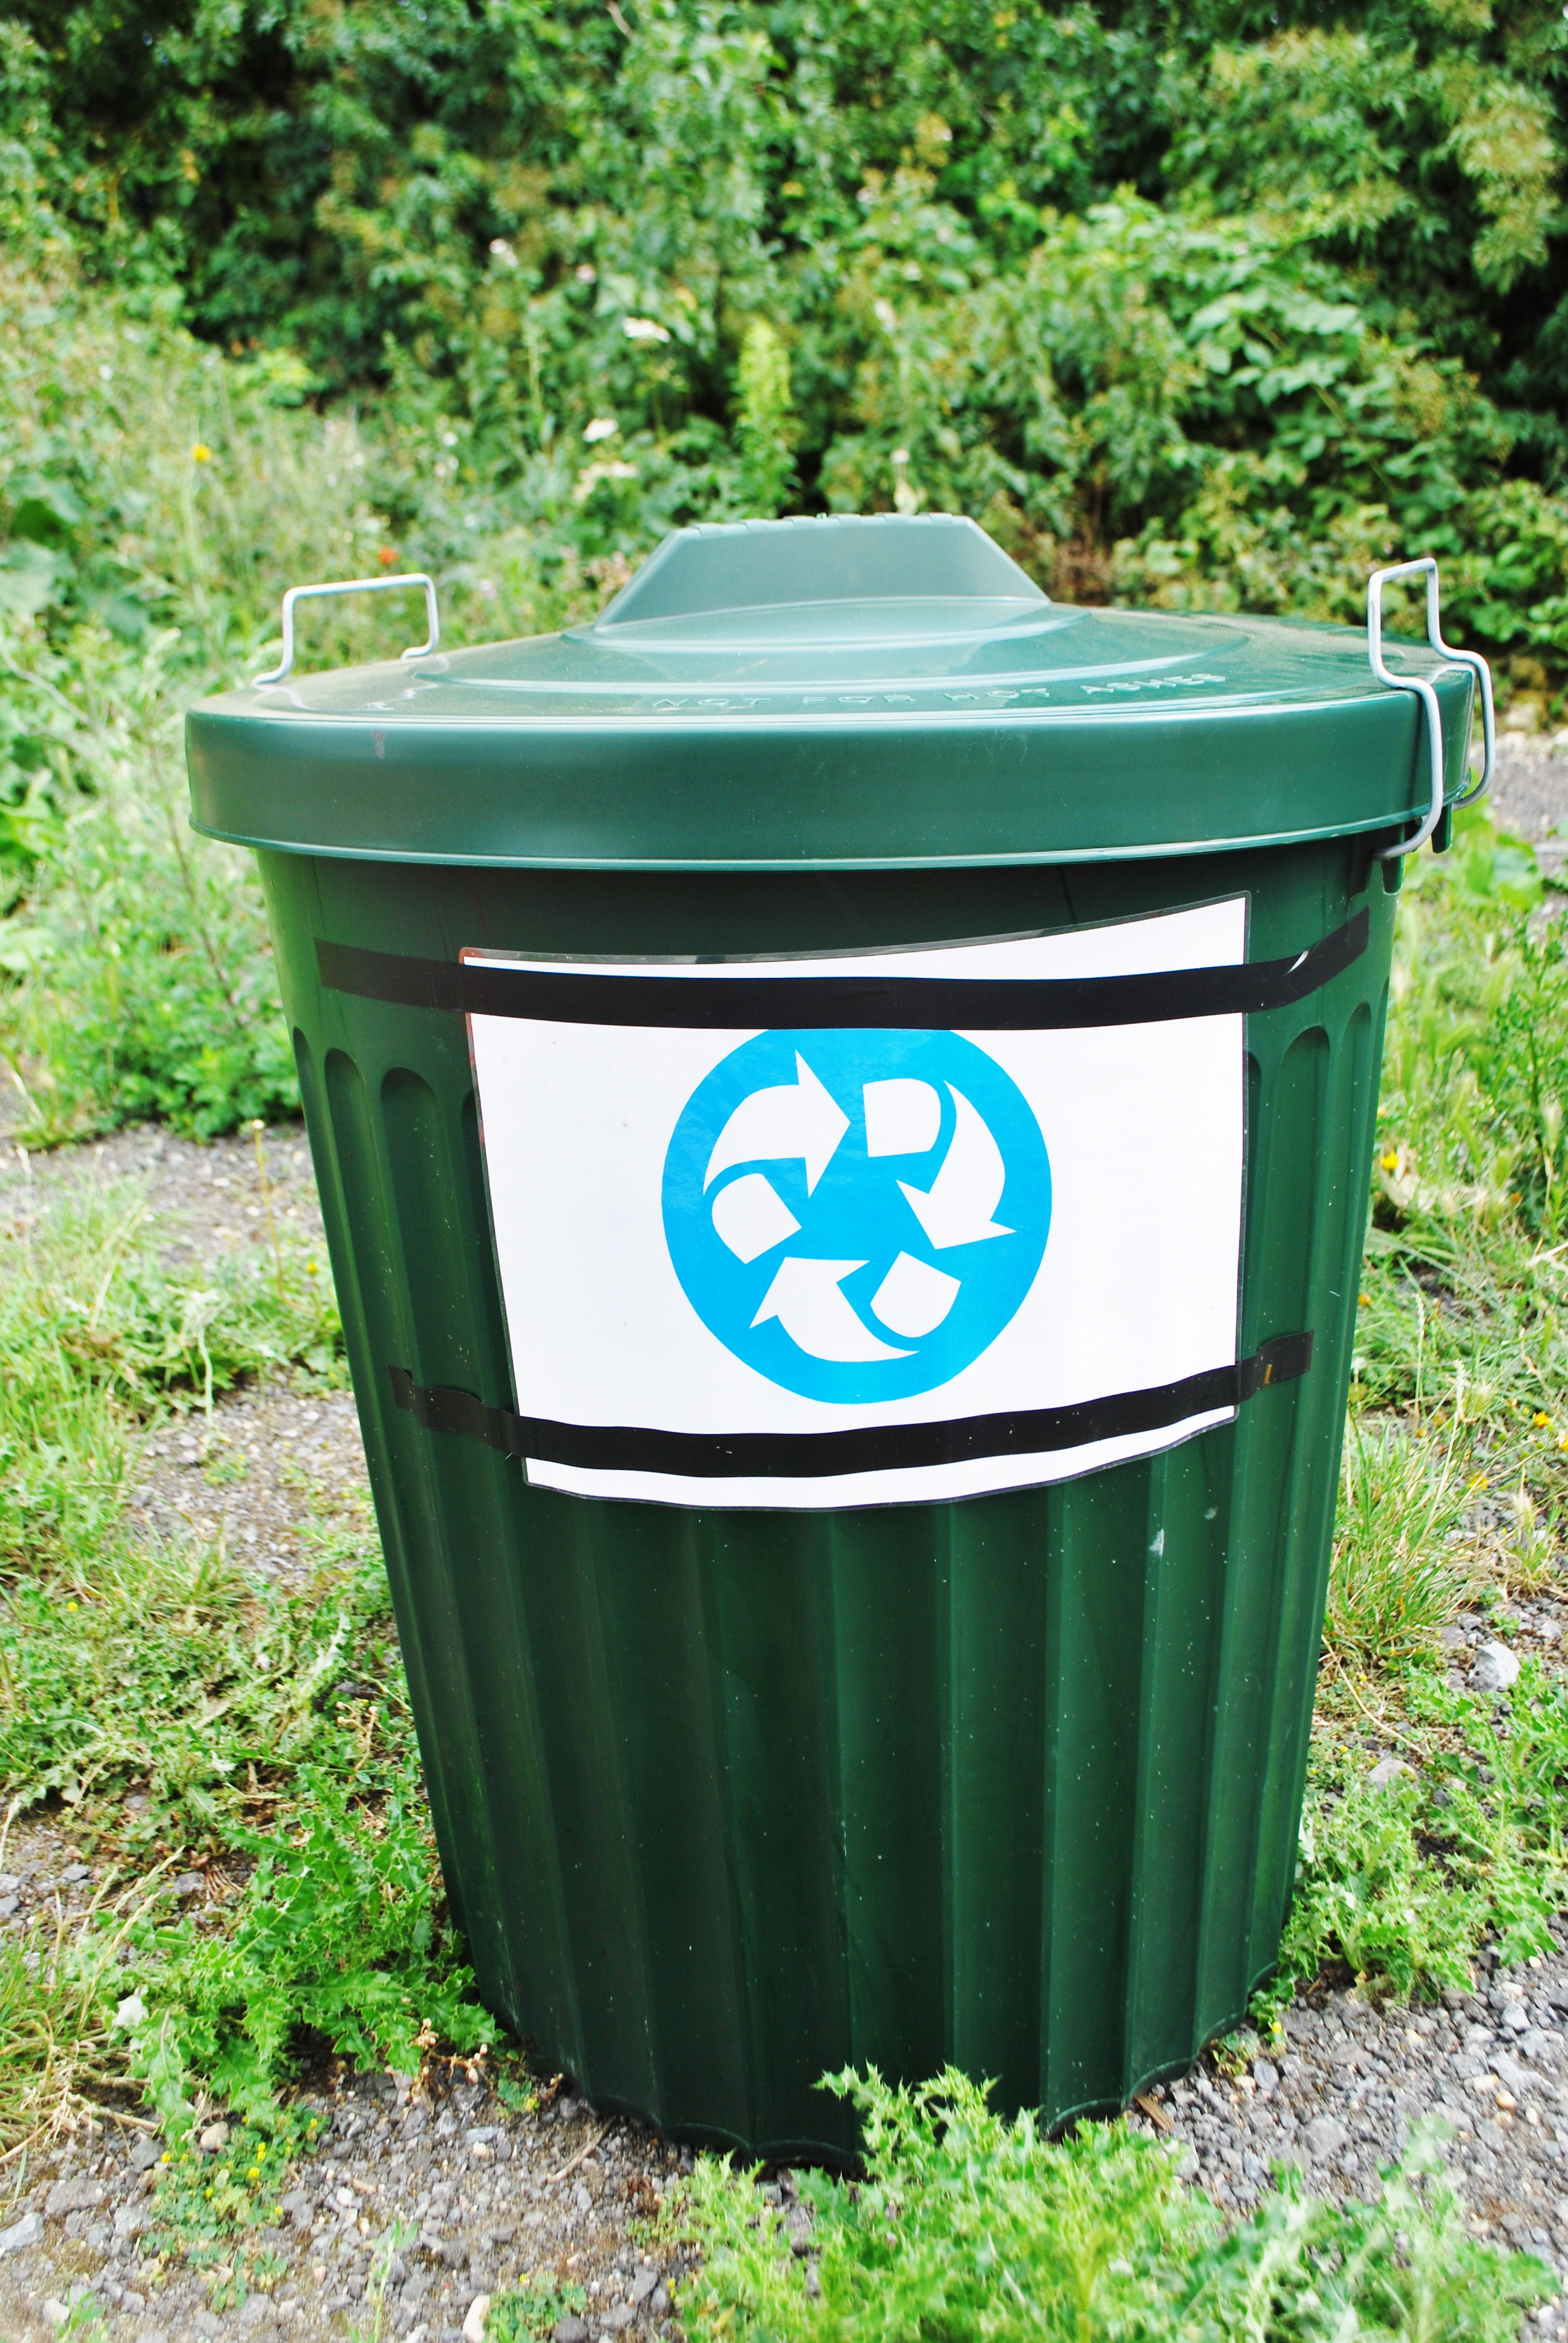 equip_green_bin